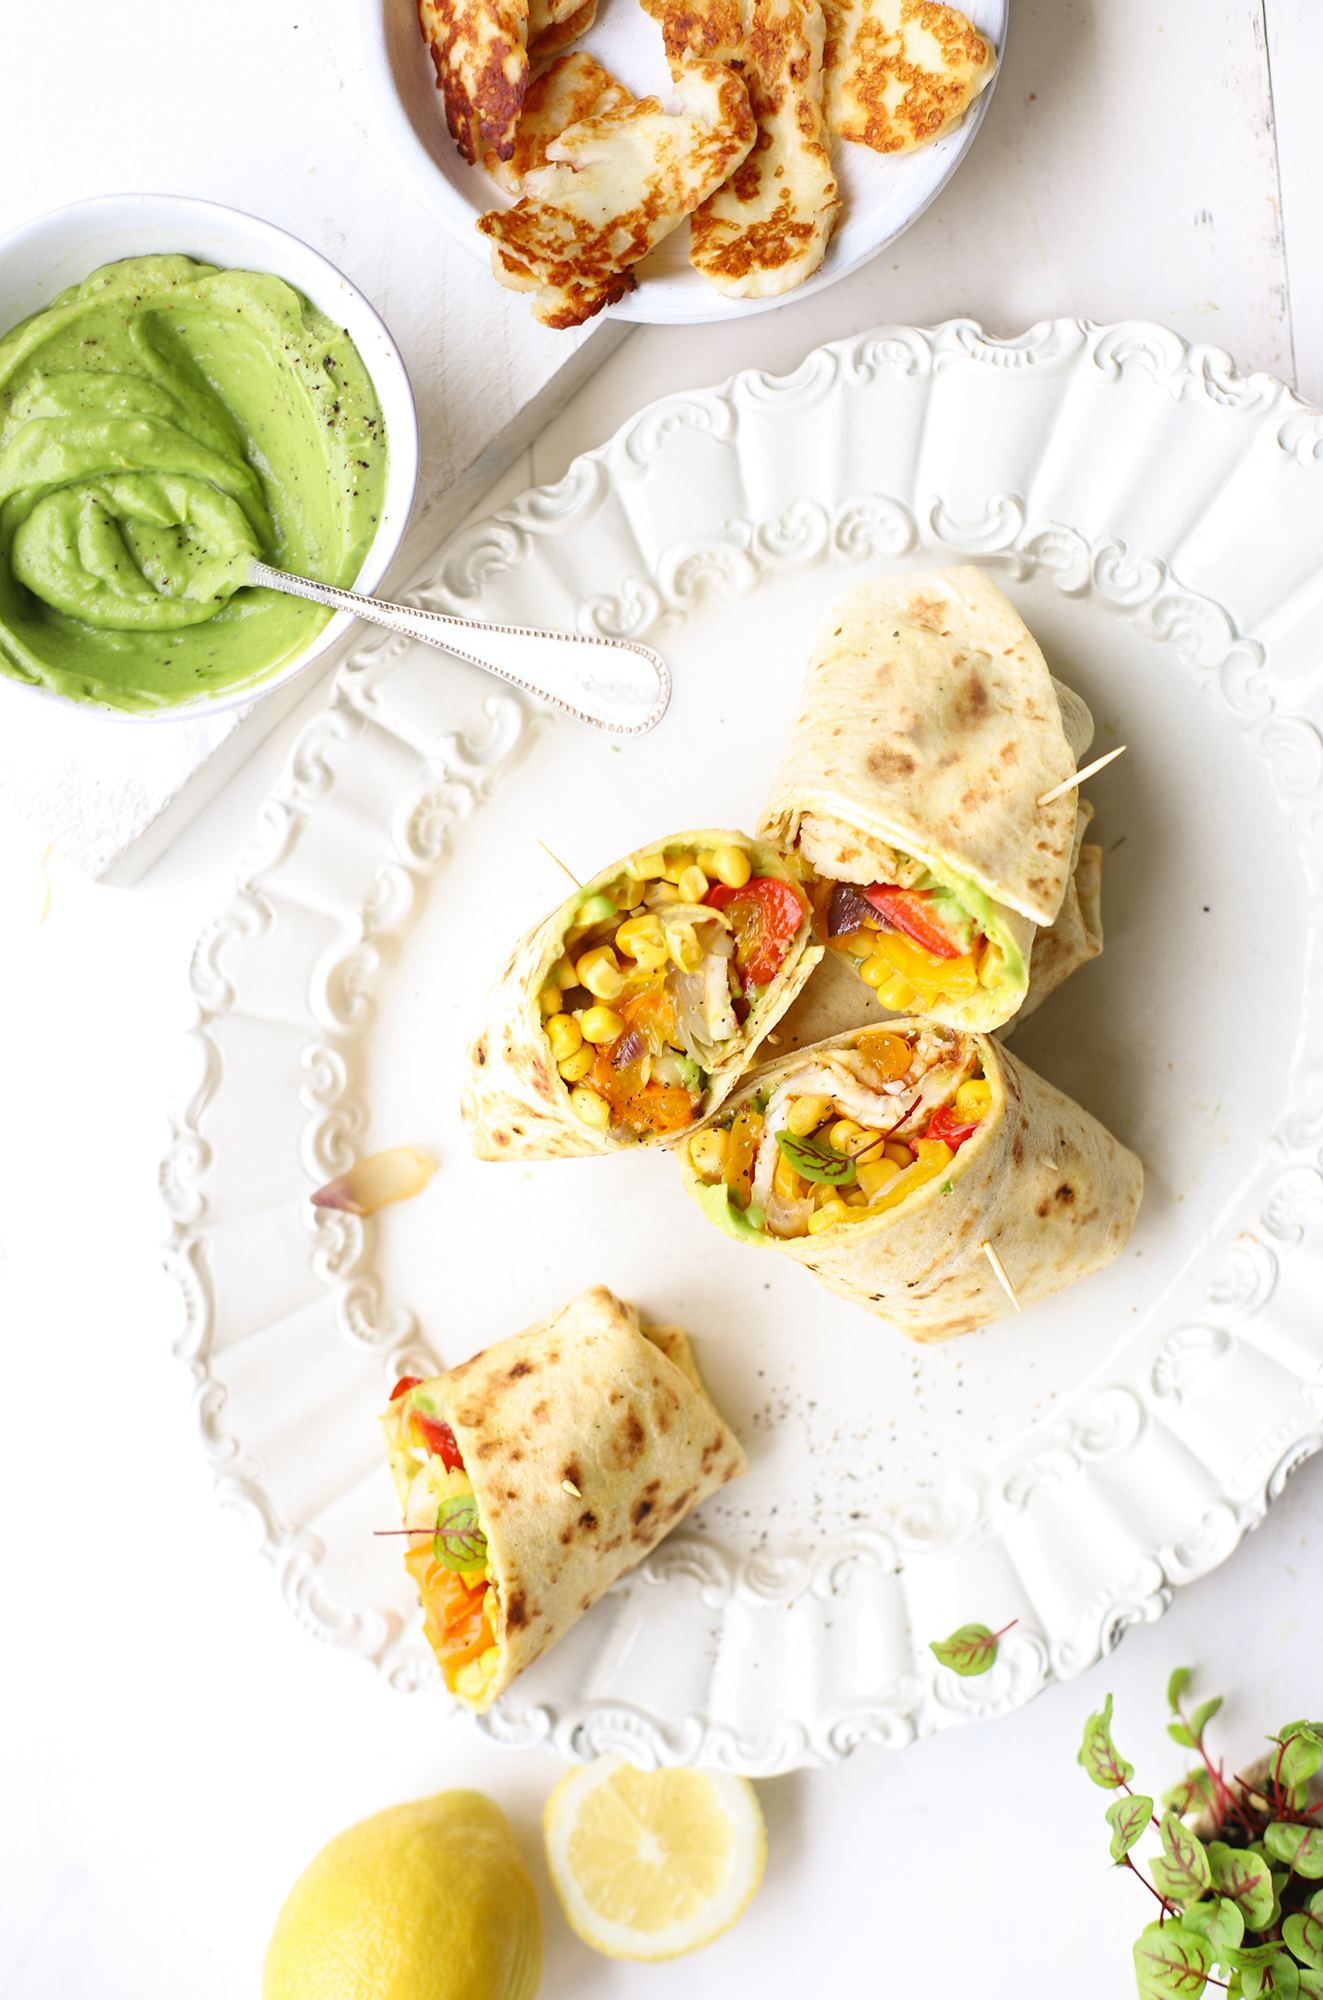 Fajita's met halloumi, avocado, paprika & citroen 'The Lemon Kitchen